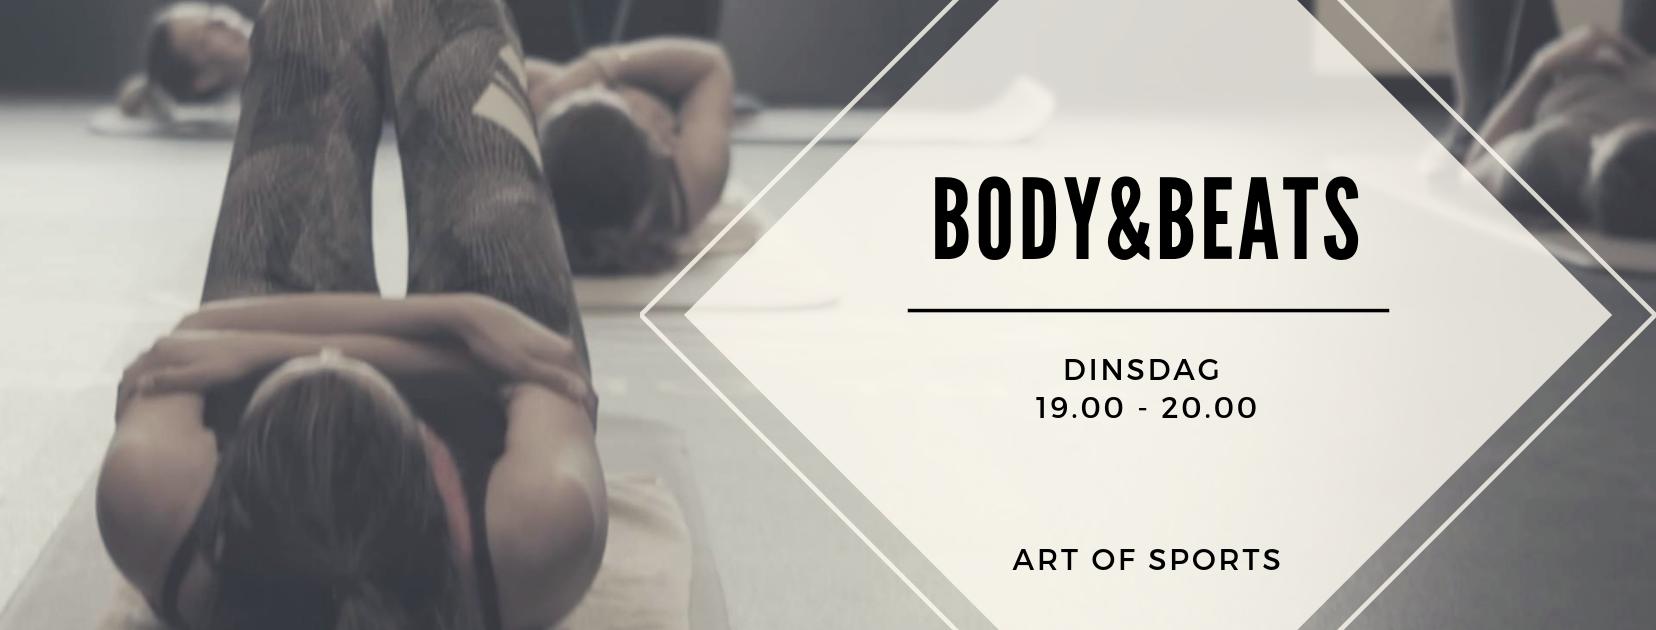 Body&Beats